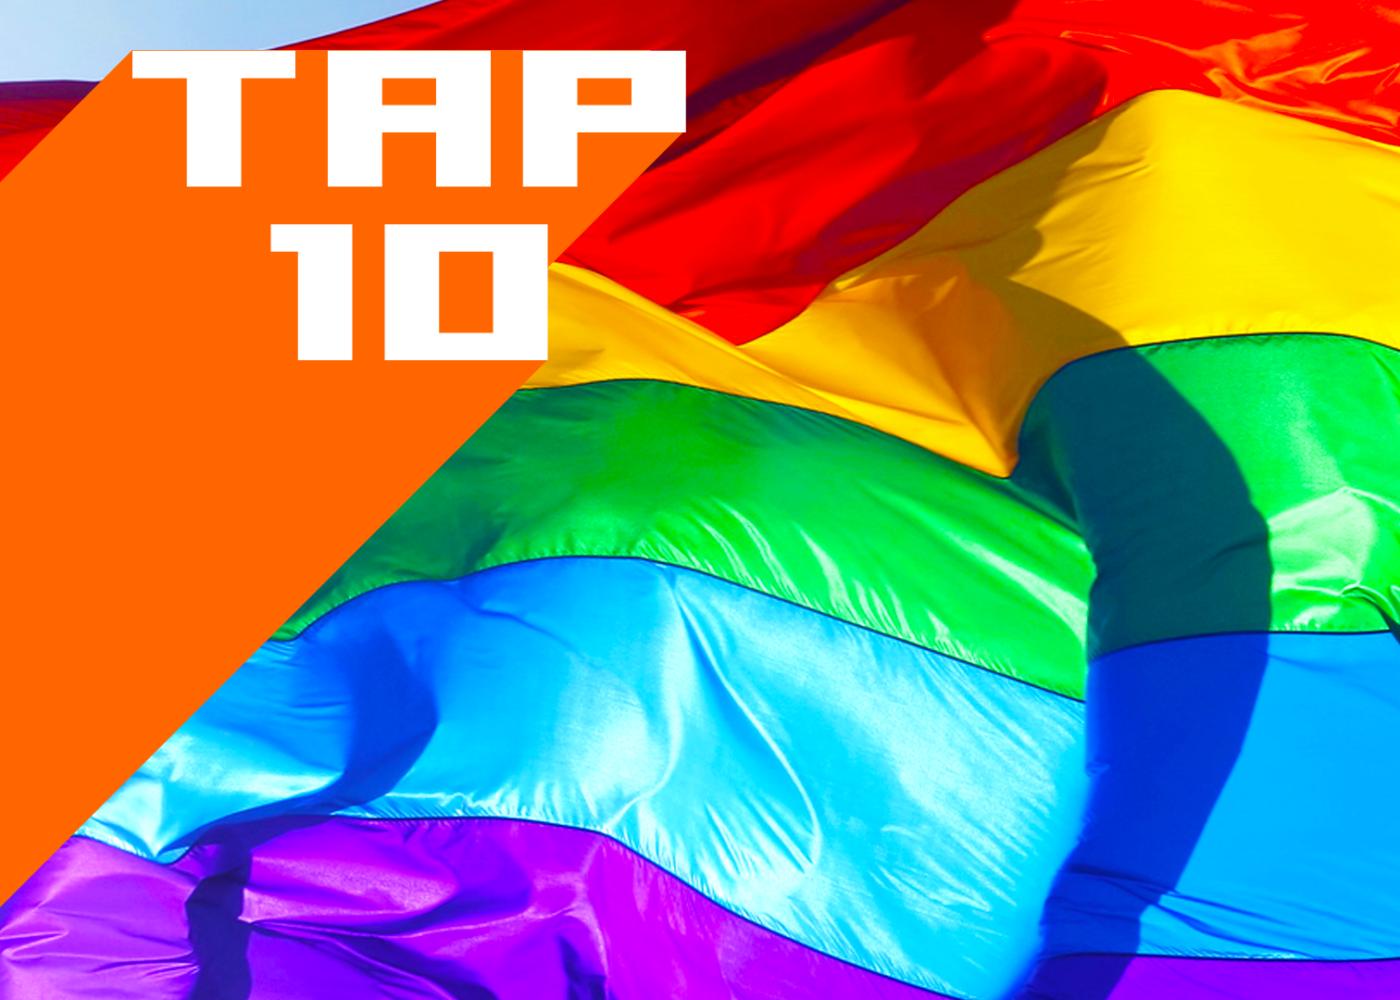 lgbtq,gay, queer, lesbian,trans,transsexual,transvestite, gaydar,comics, comic book heroes, northstar, apollo, dc comics, marvel comics, marvel, renee montoya, batwoman, lightning lass, hulking, rainbow,pride, constantine,bisexual, coagula,the action pixel,entertainment on tap, tap10 , #tap10 , top ten list,comics, comic book, comic book characters,